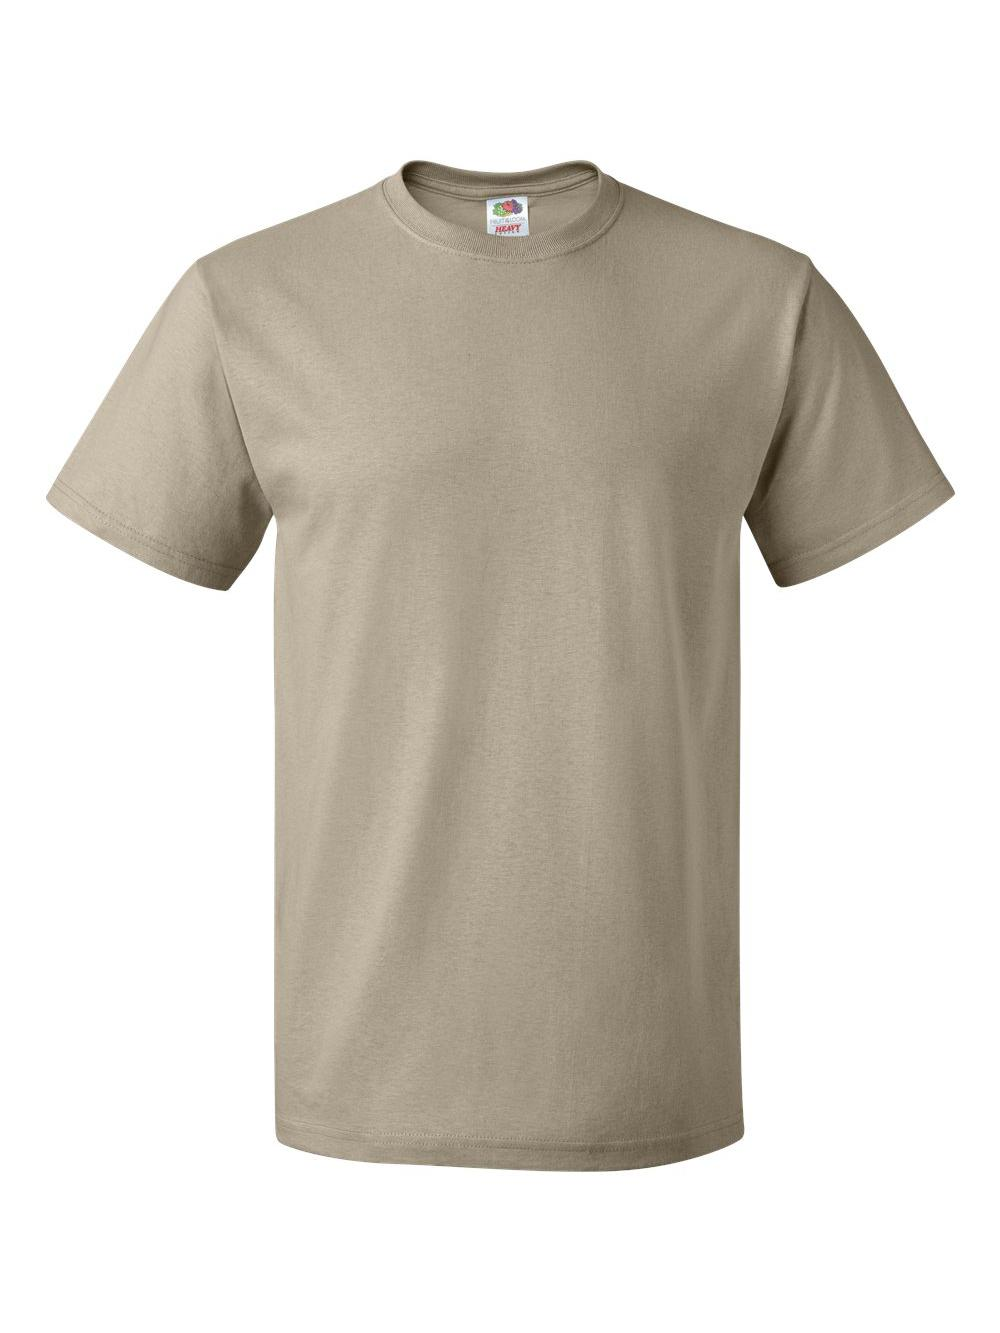 Fruit-of-the-Loom-HD-Cotton-Short-Sleeve-T-Shirt-3930R thumbnail 66